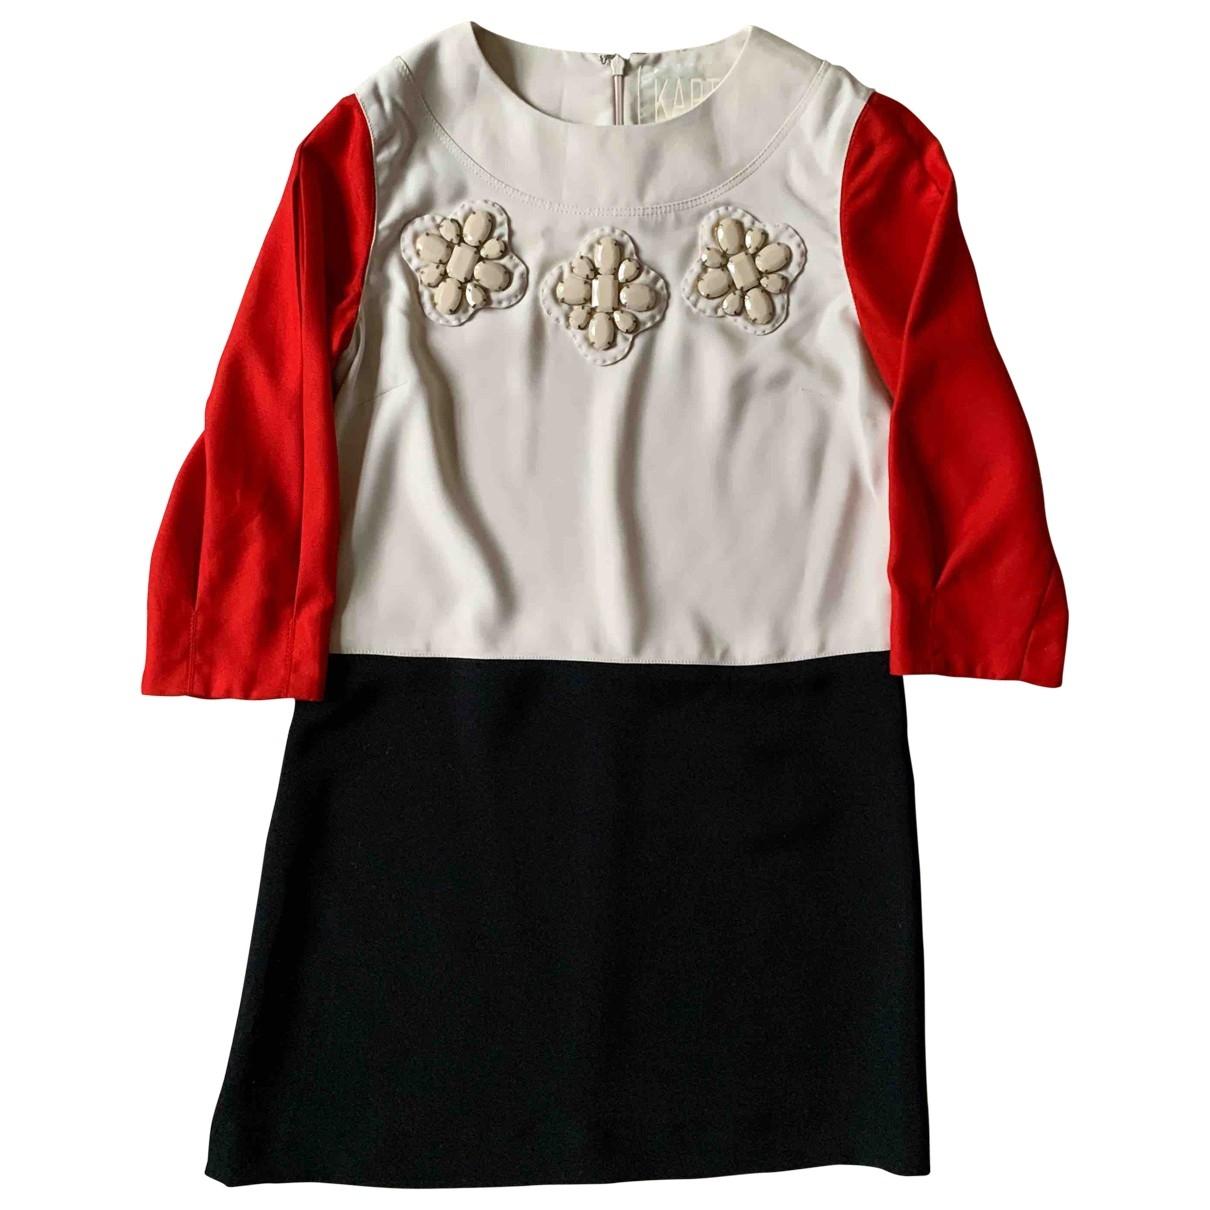 Karta - Robe   pour femme - multicolore